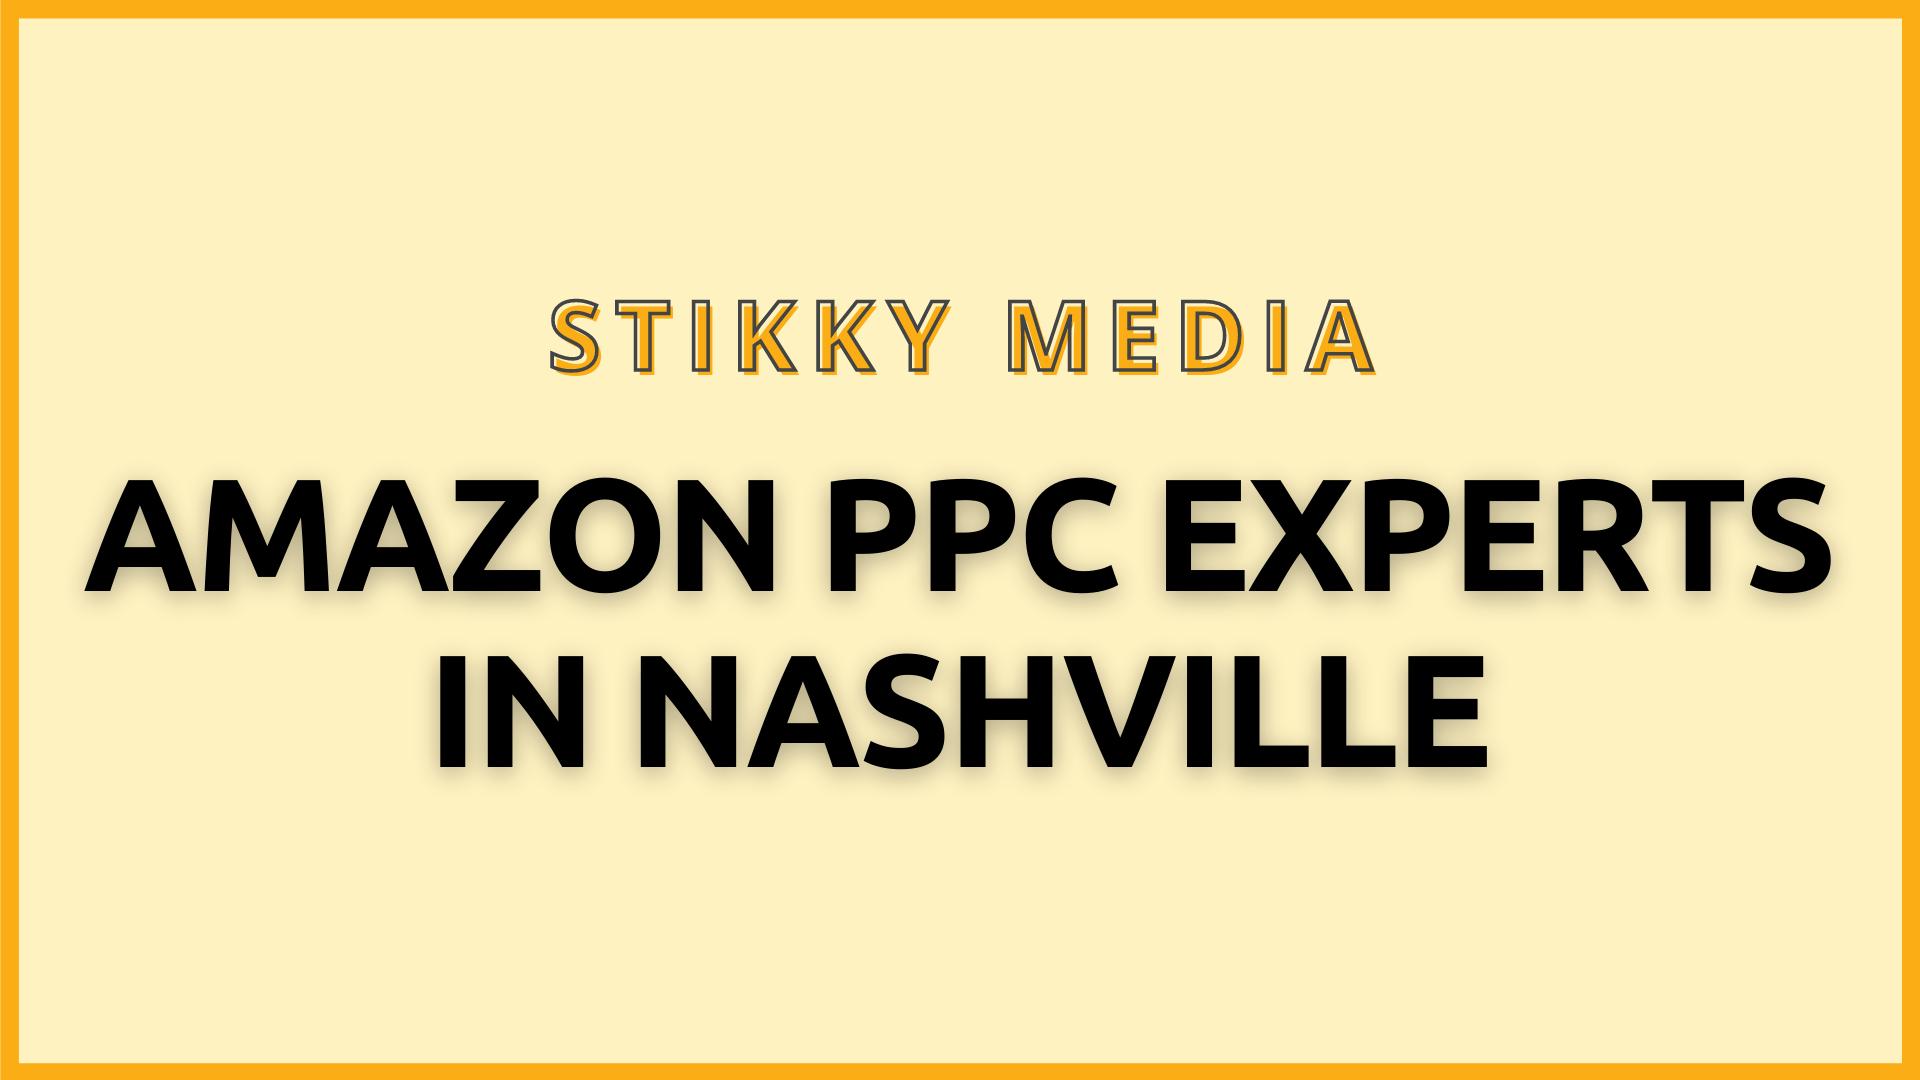 Amazon PPC Management in Nashville - Stikky Media